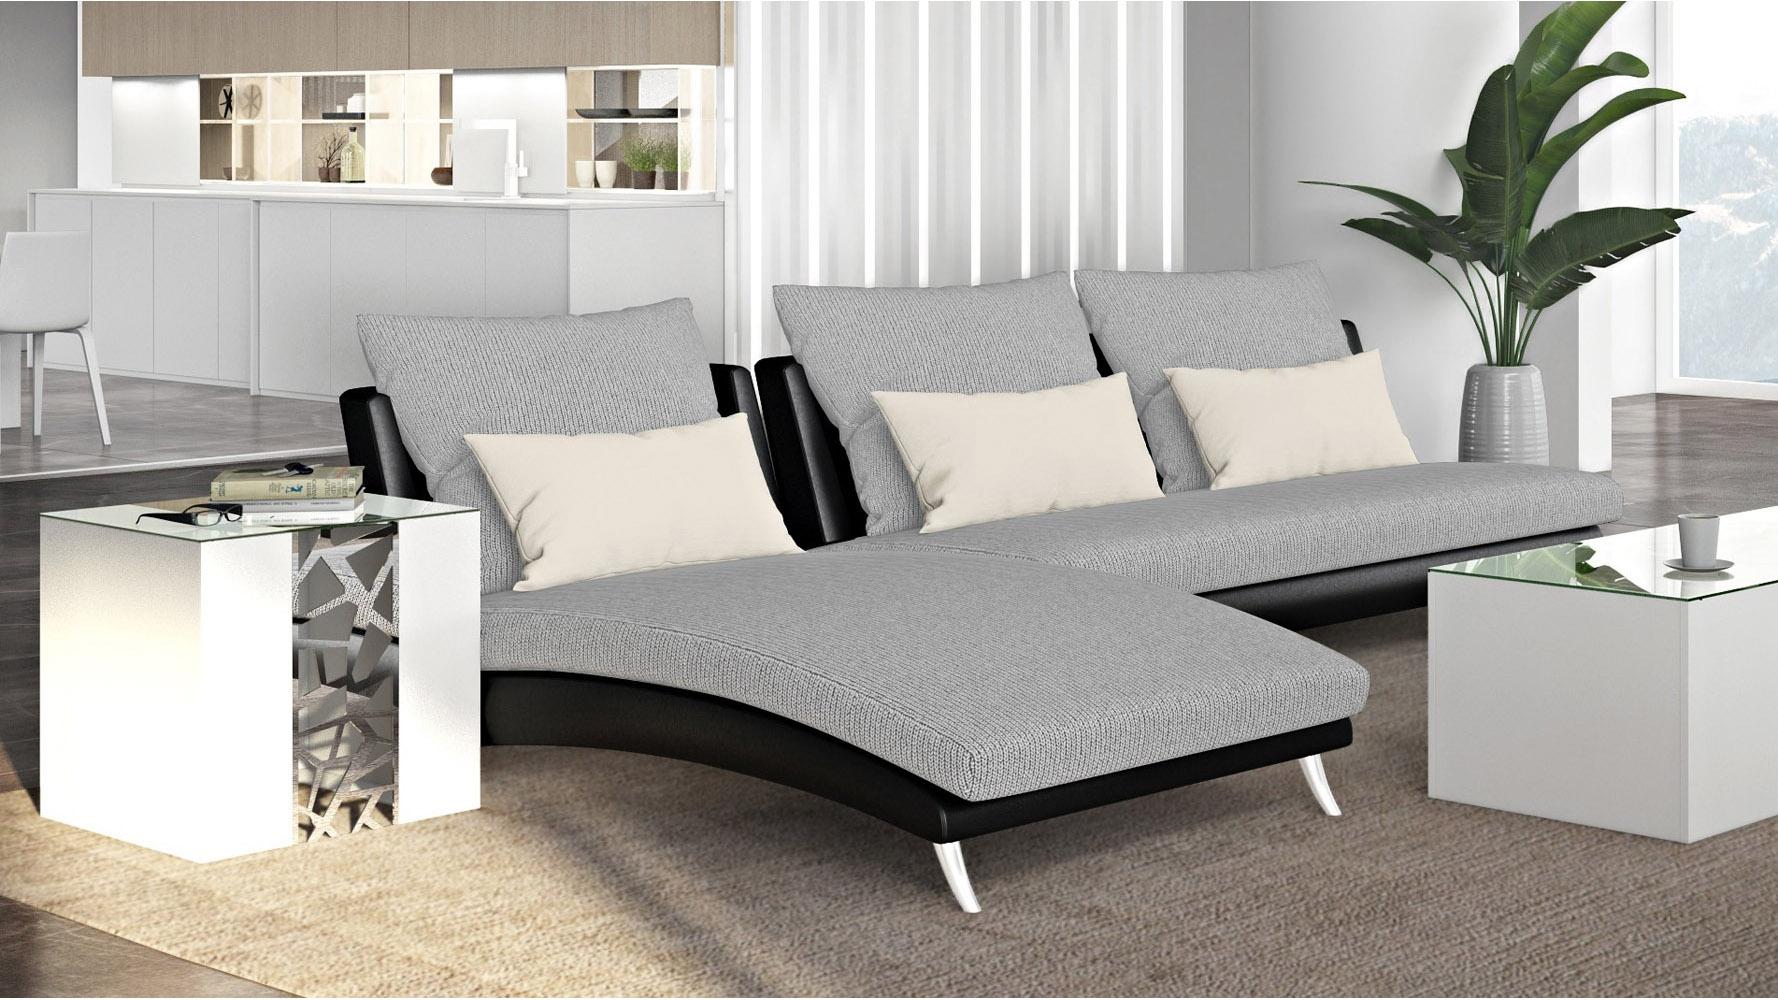 Palms Modular Chaise Fabric Cushions Leatherette Black